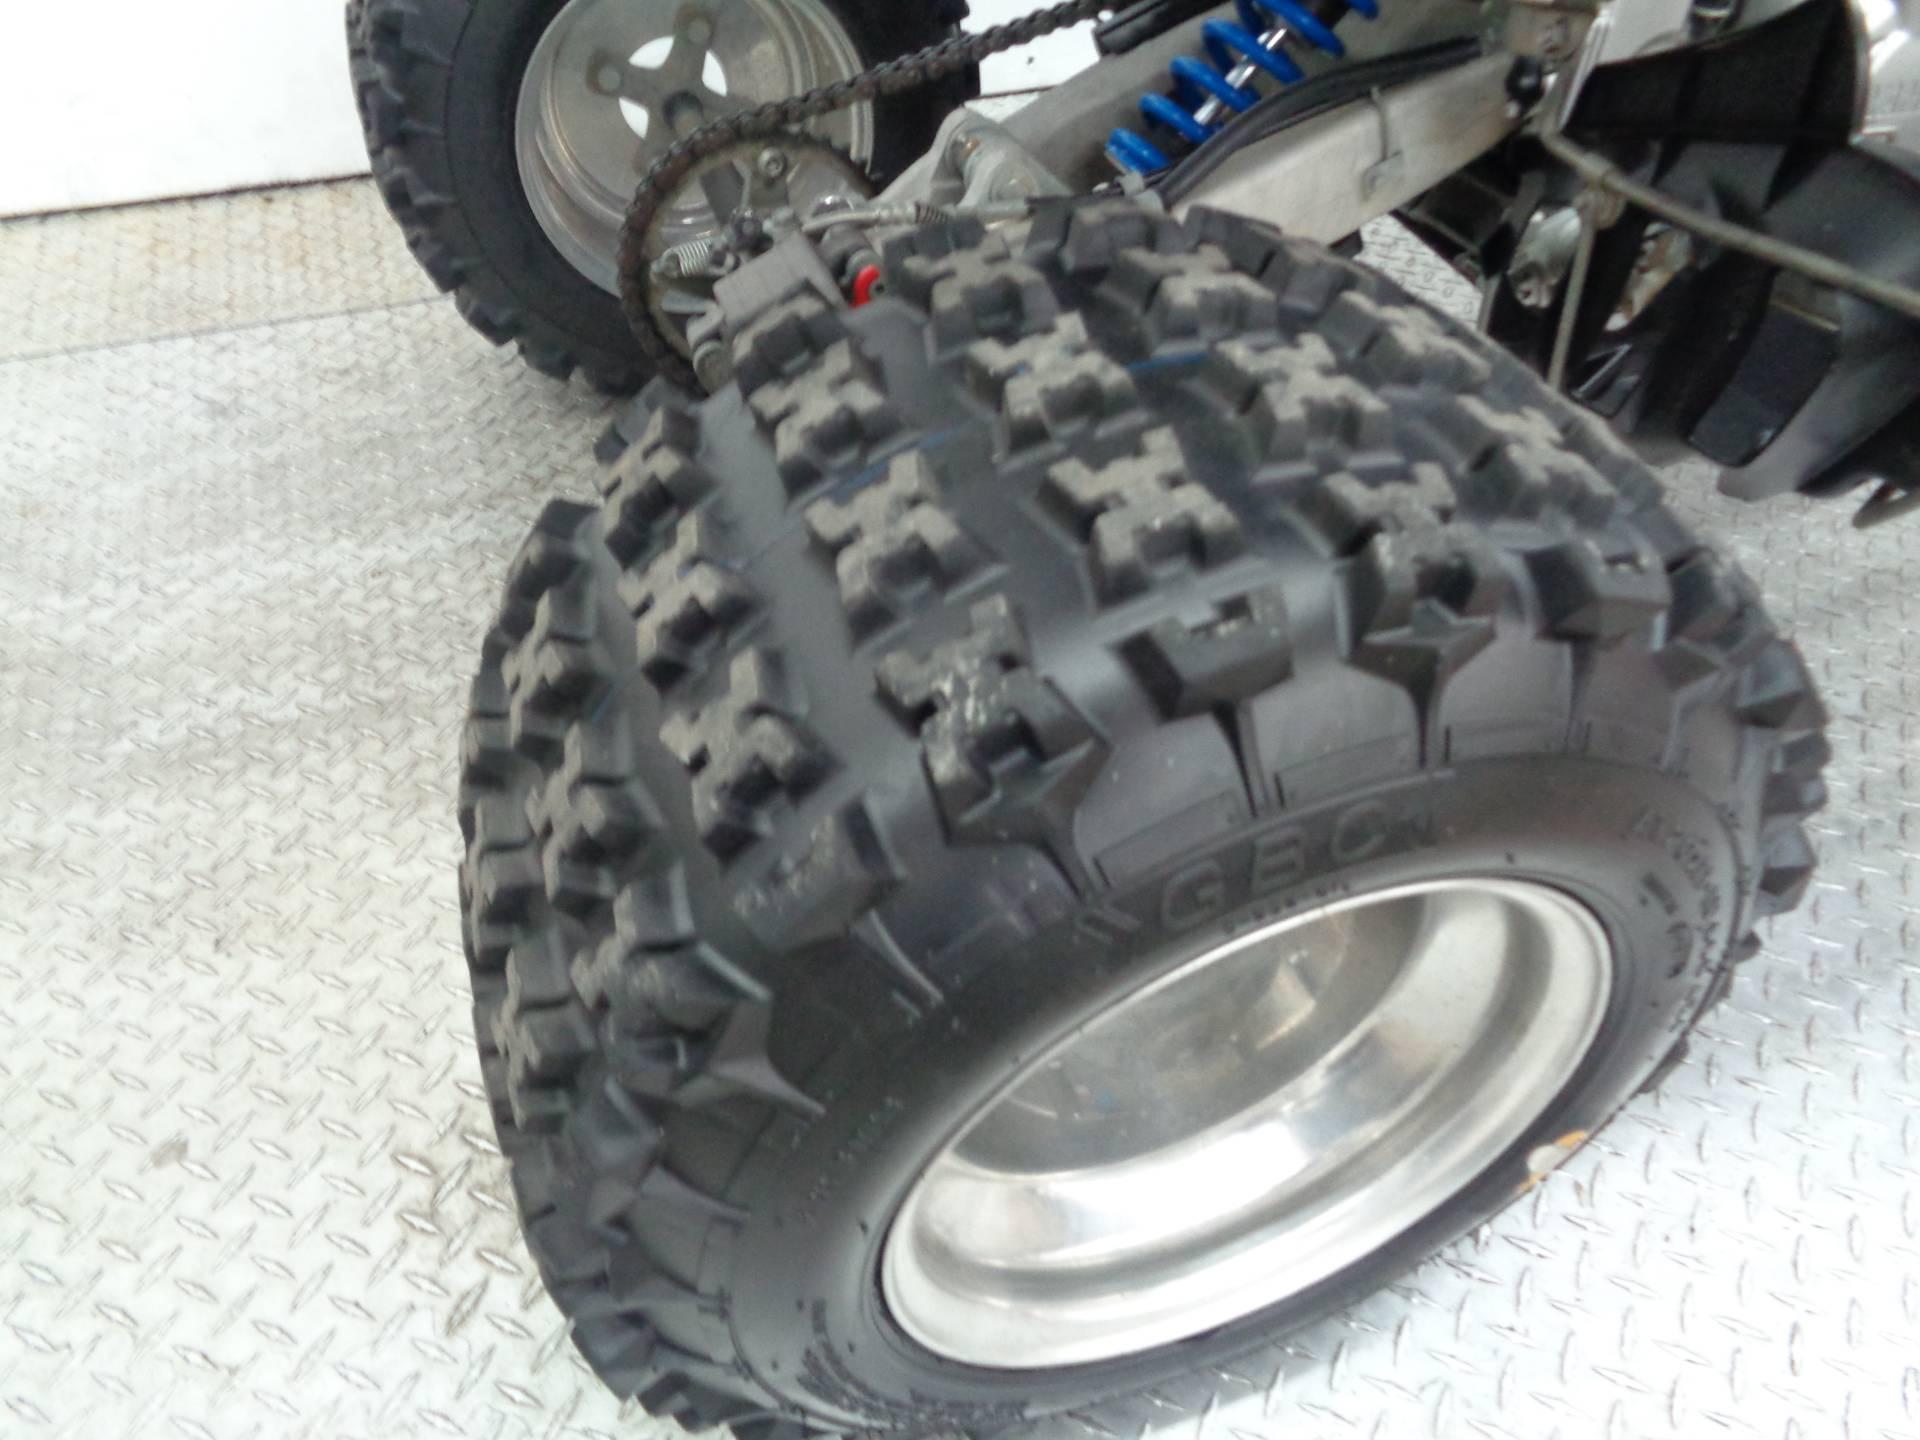 2011 Yamaha Raptor 700R 5